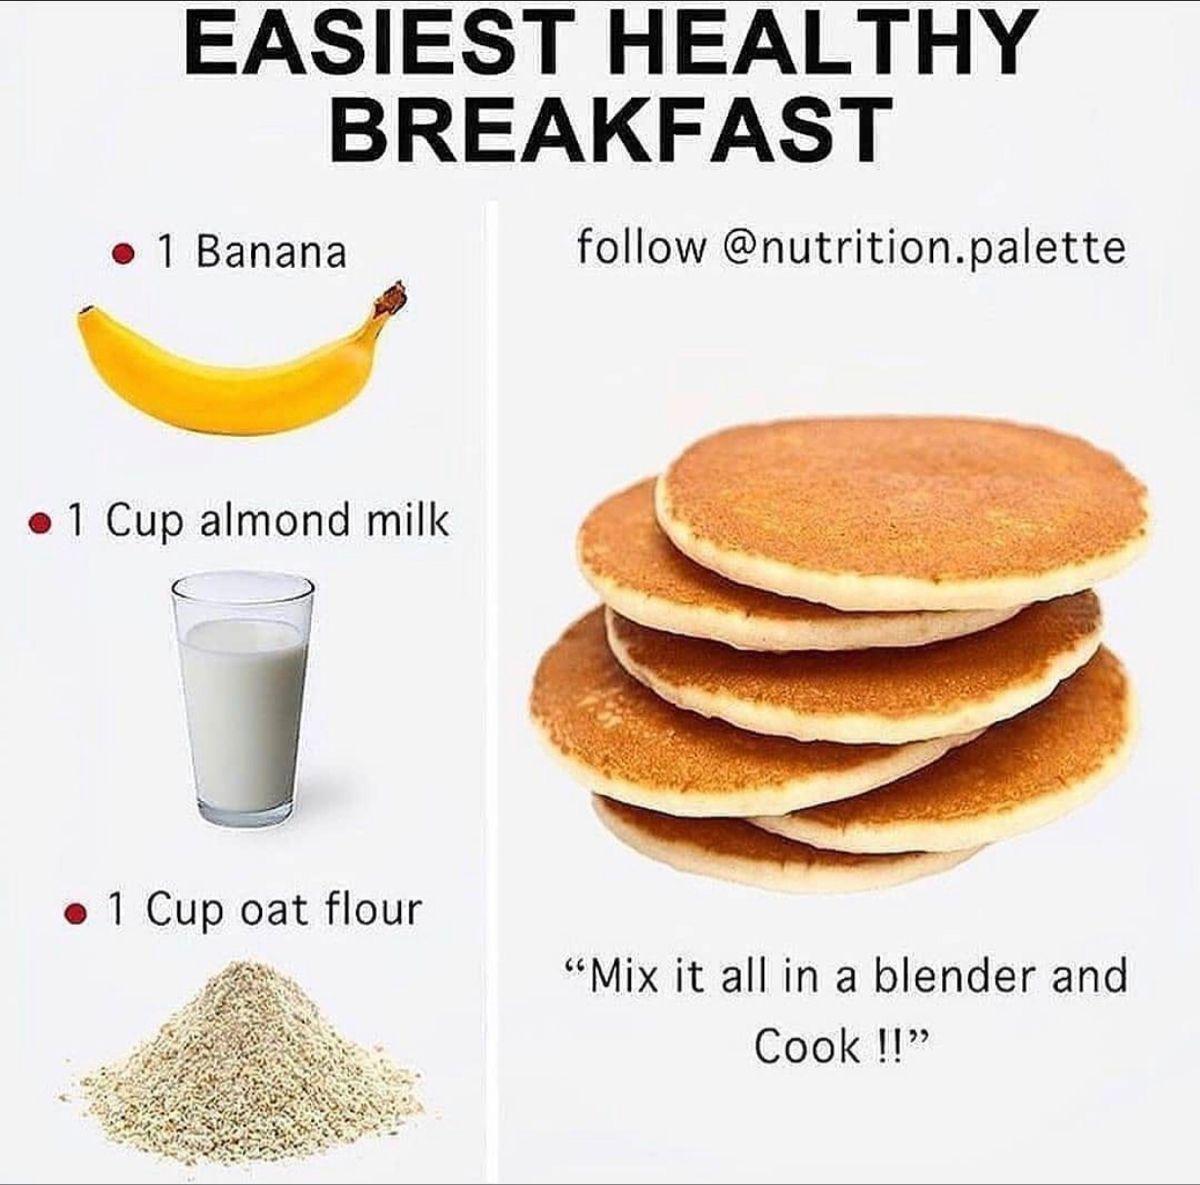 Easiest Healthy Breakfast Easy Healthy Breakfast Super Low Calorie Recipes Super Low Calorie